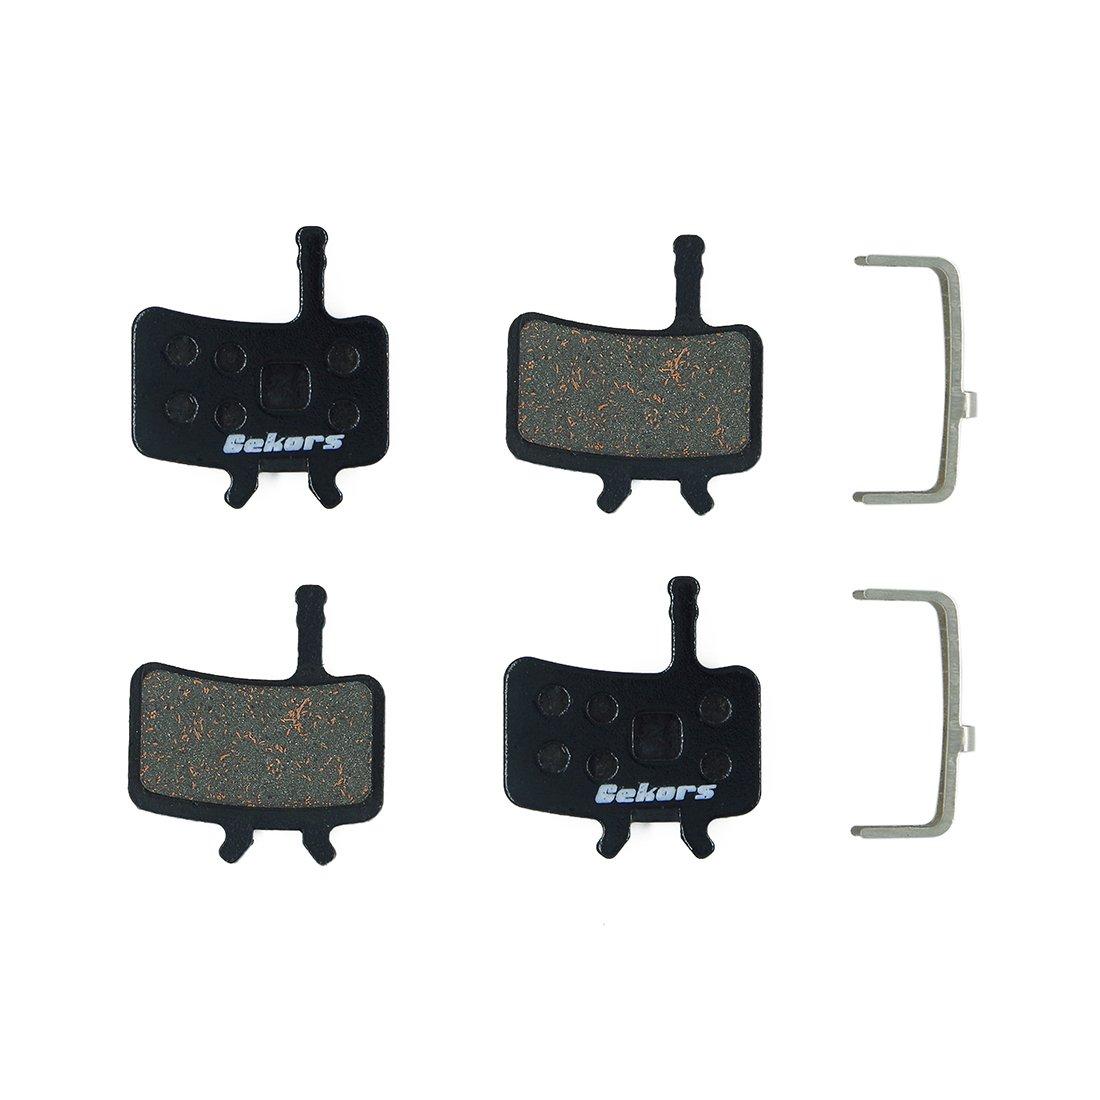 2 Pairs Metal Bicycle Brake Pads for Sram Avid BB7 Mechanical disc brake